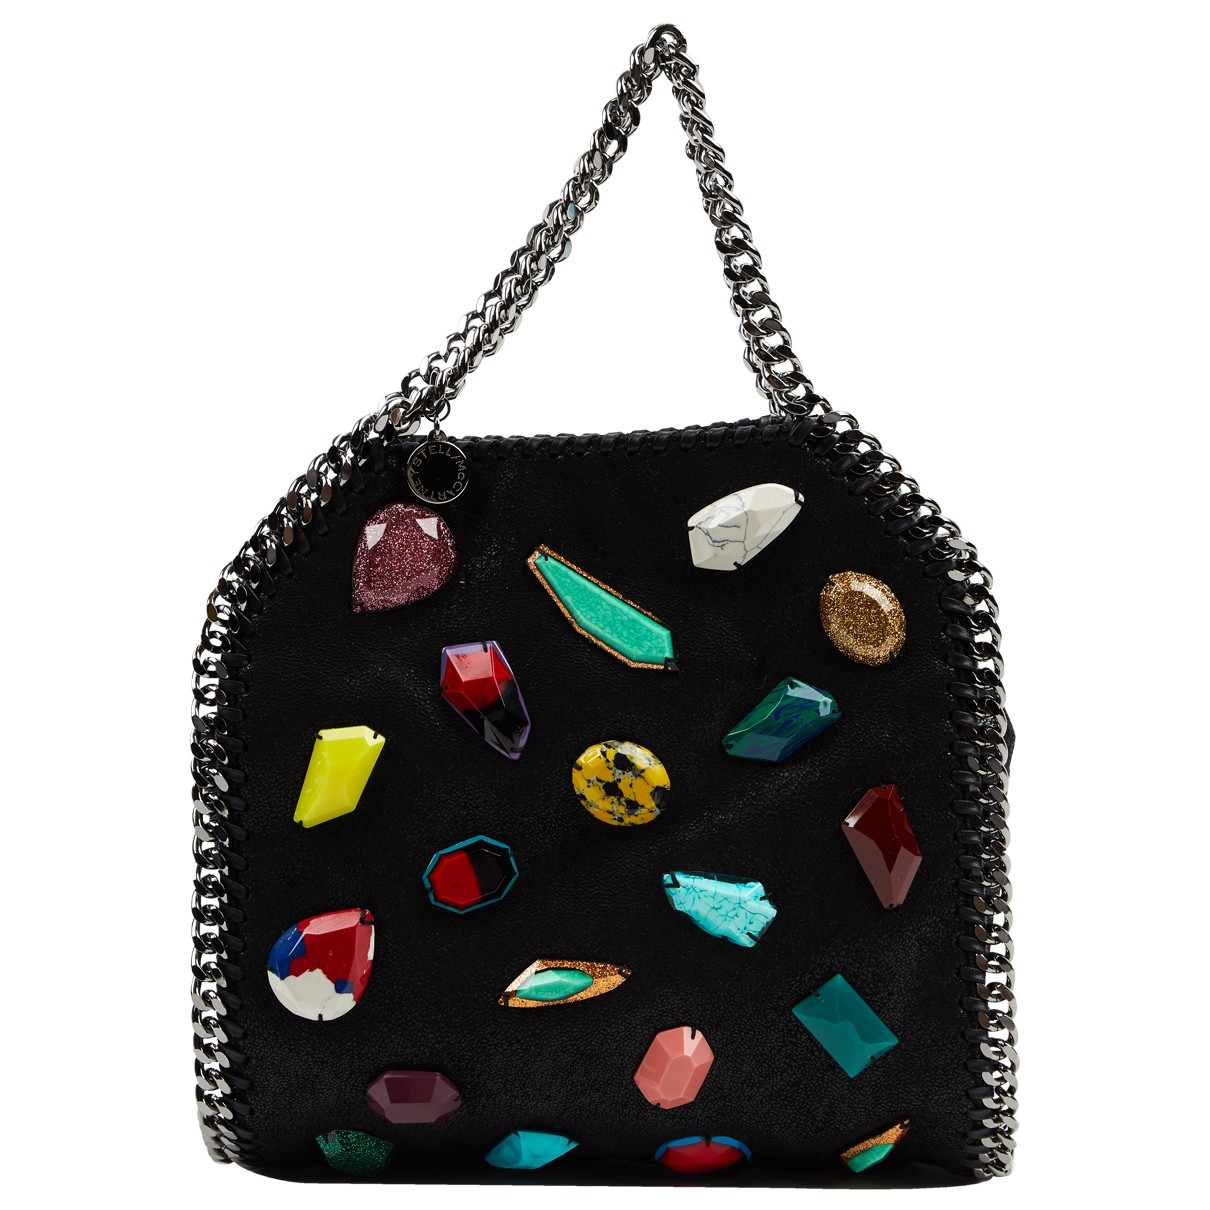 Stella Mccartney Falabella Handtasche in  Schwarz Synthetik